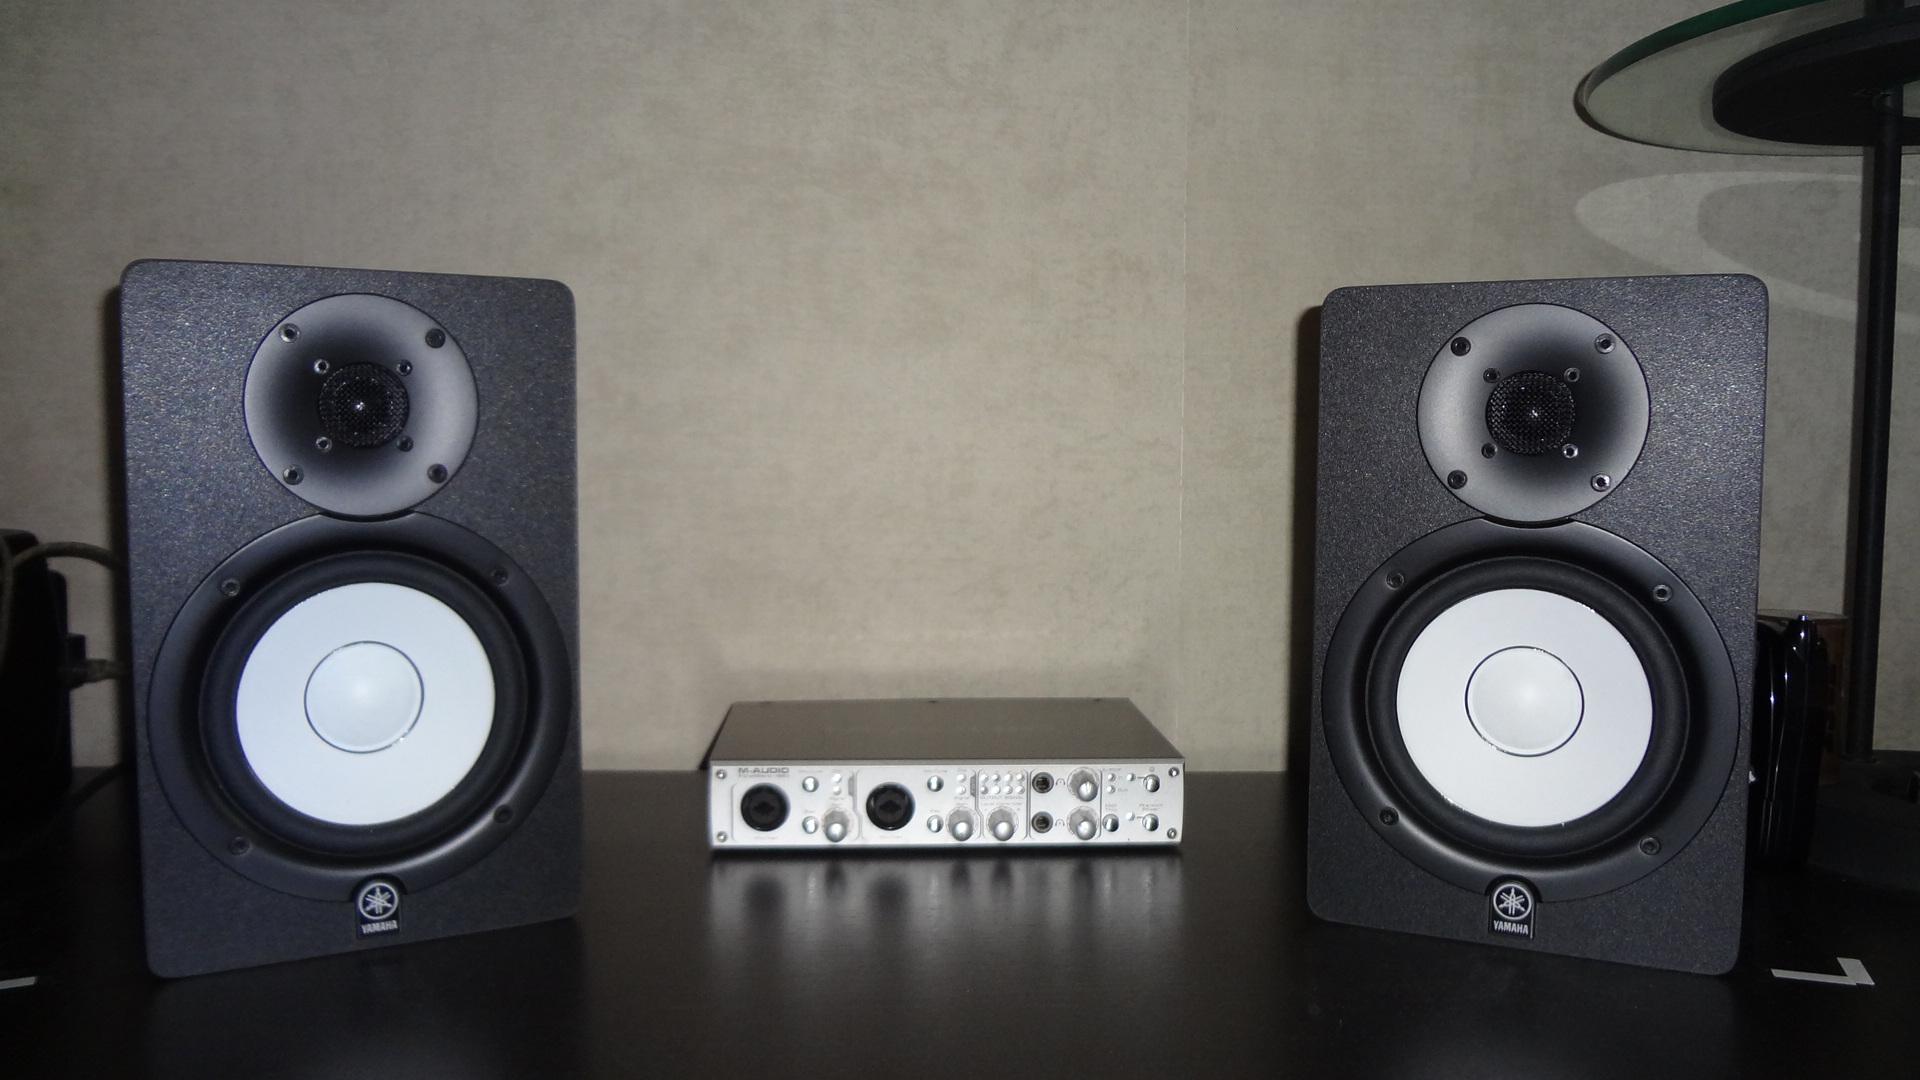 Yamaha hs50m image 891455 audiofanzine for Yamaha hs50m review